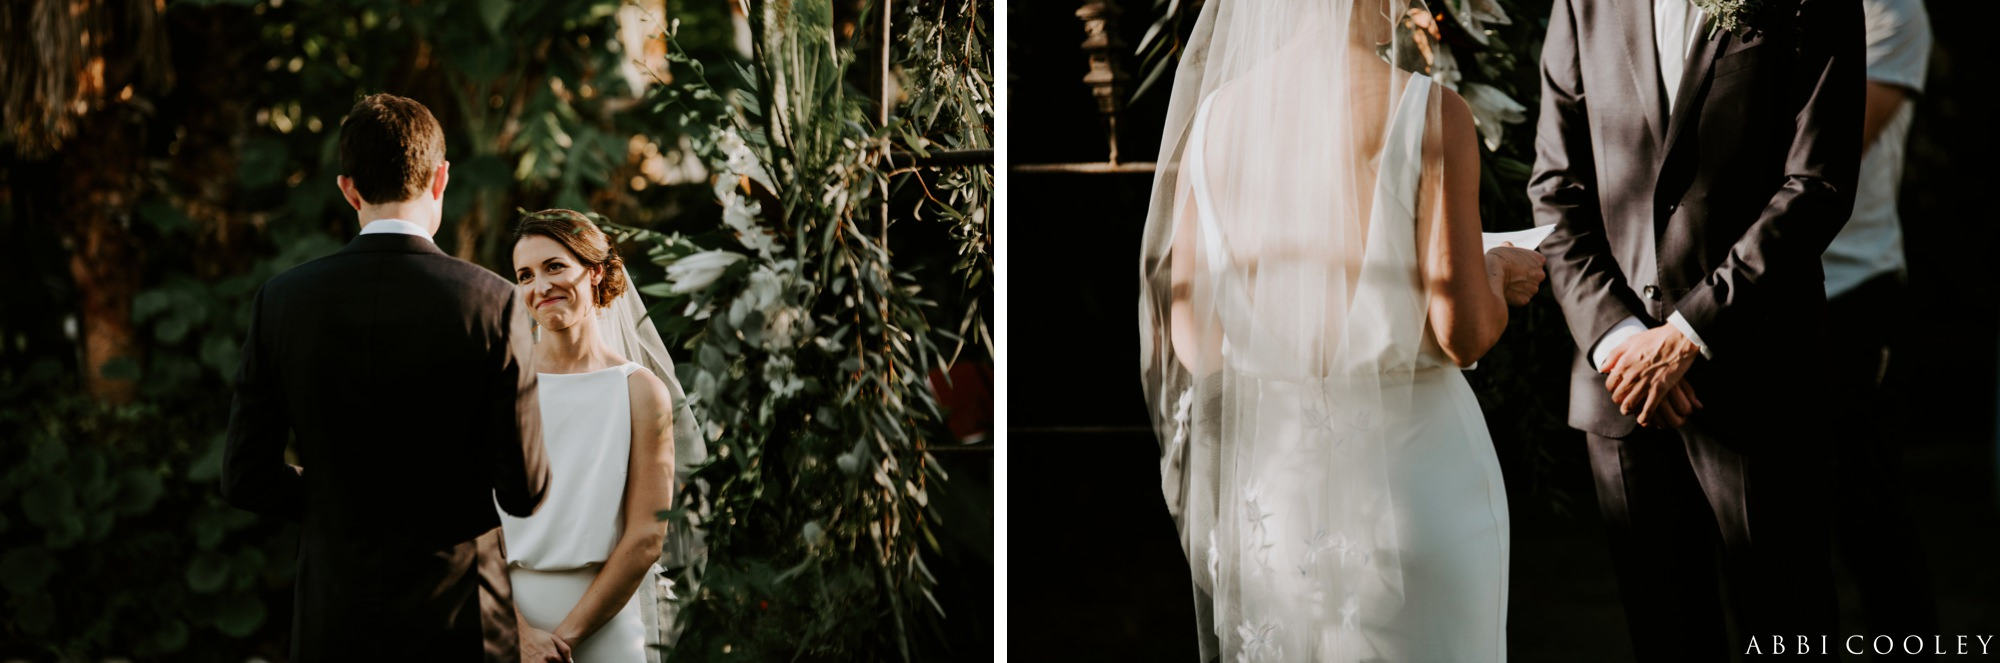 ABBI COOLEY PALM SPRINGS WEDDING_0797